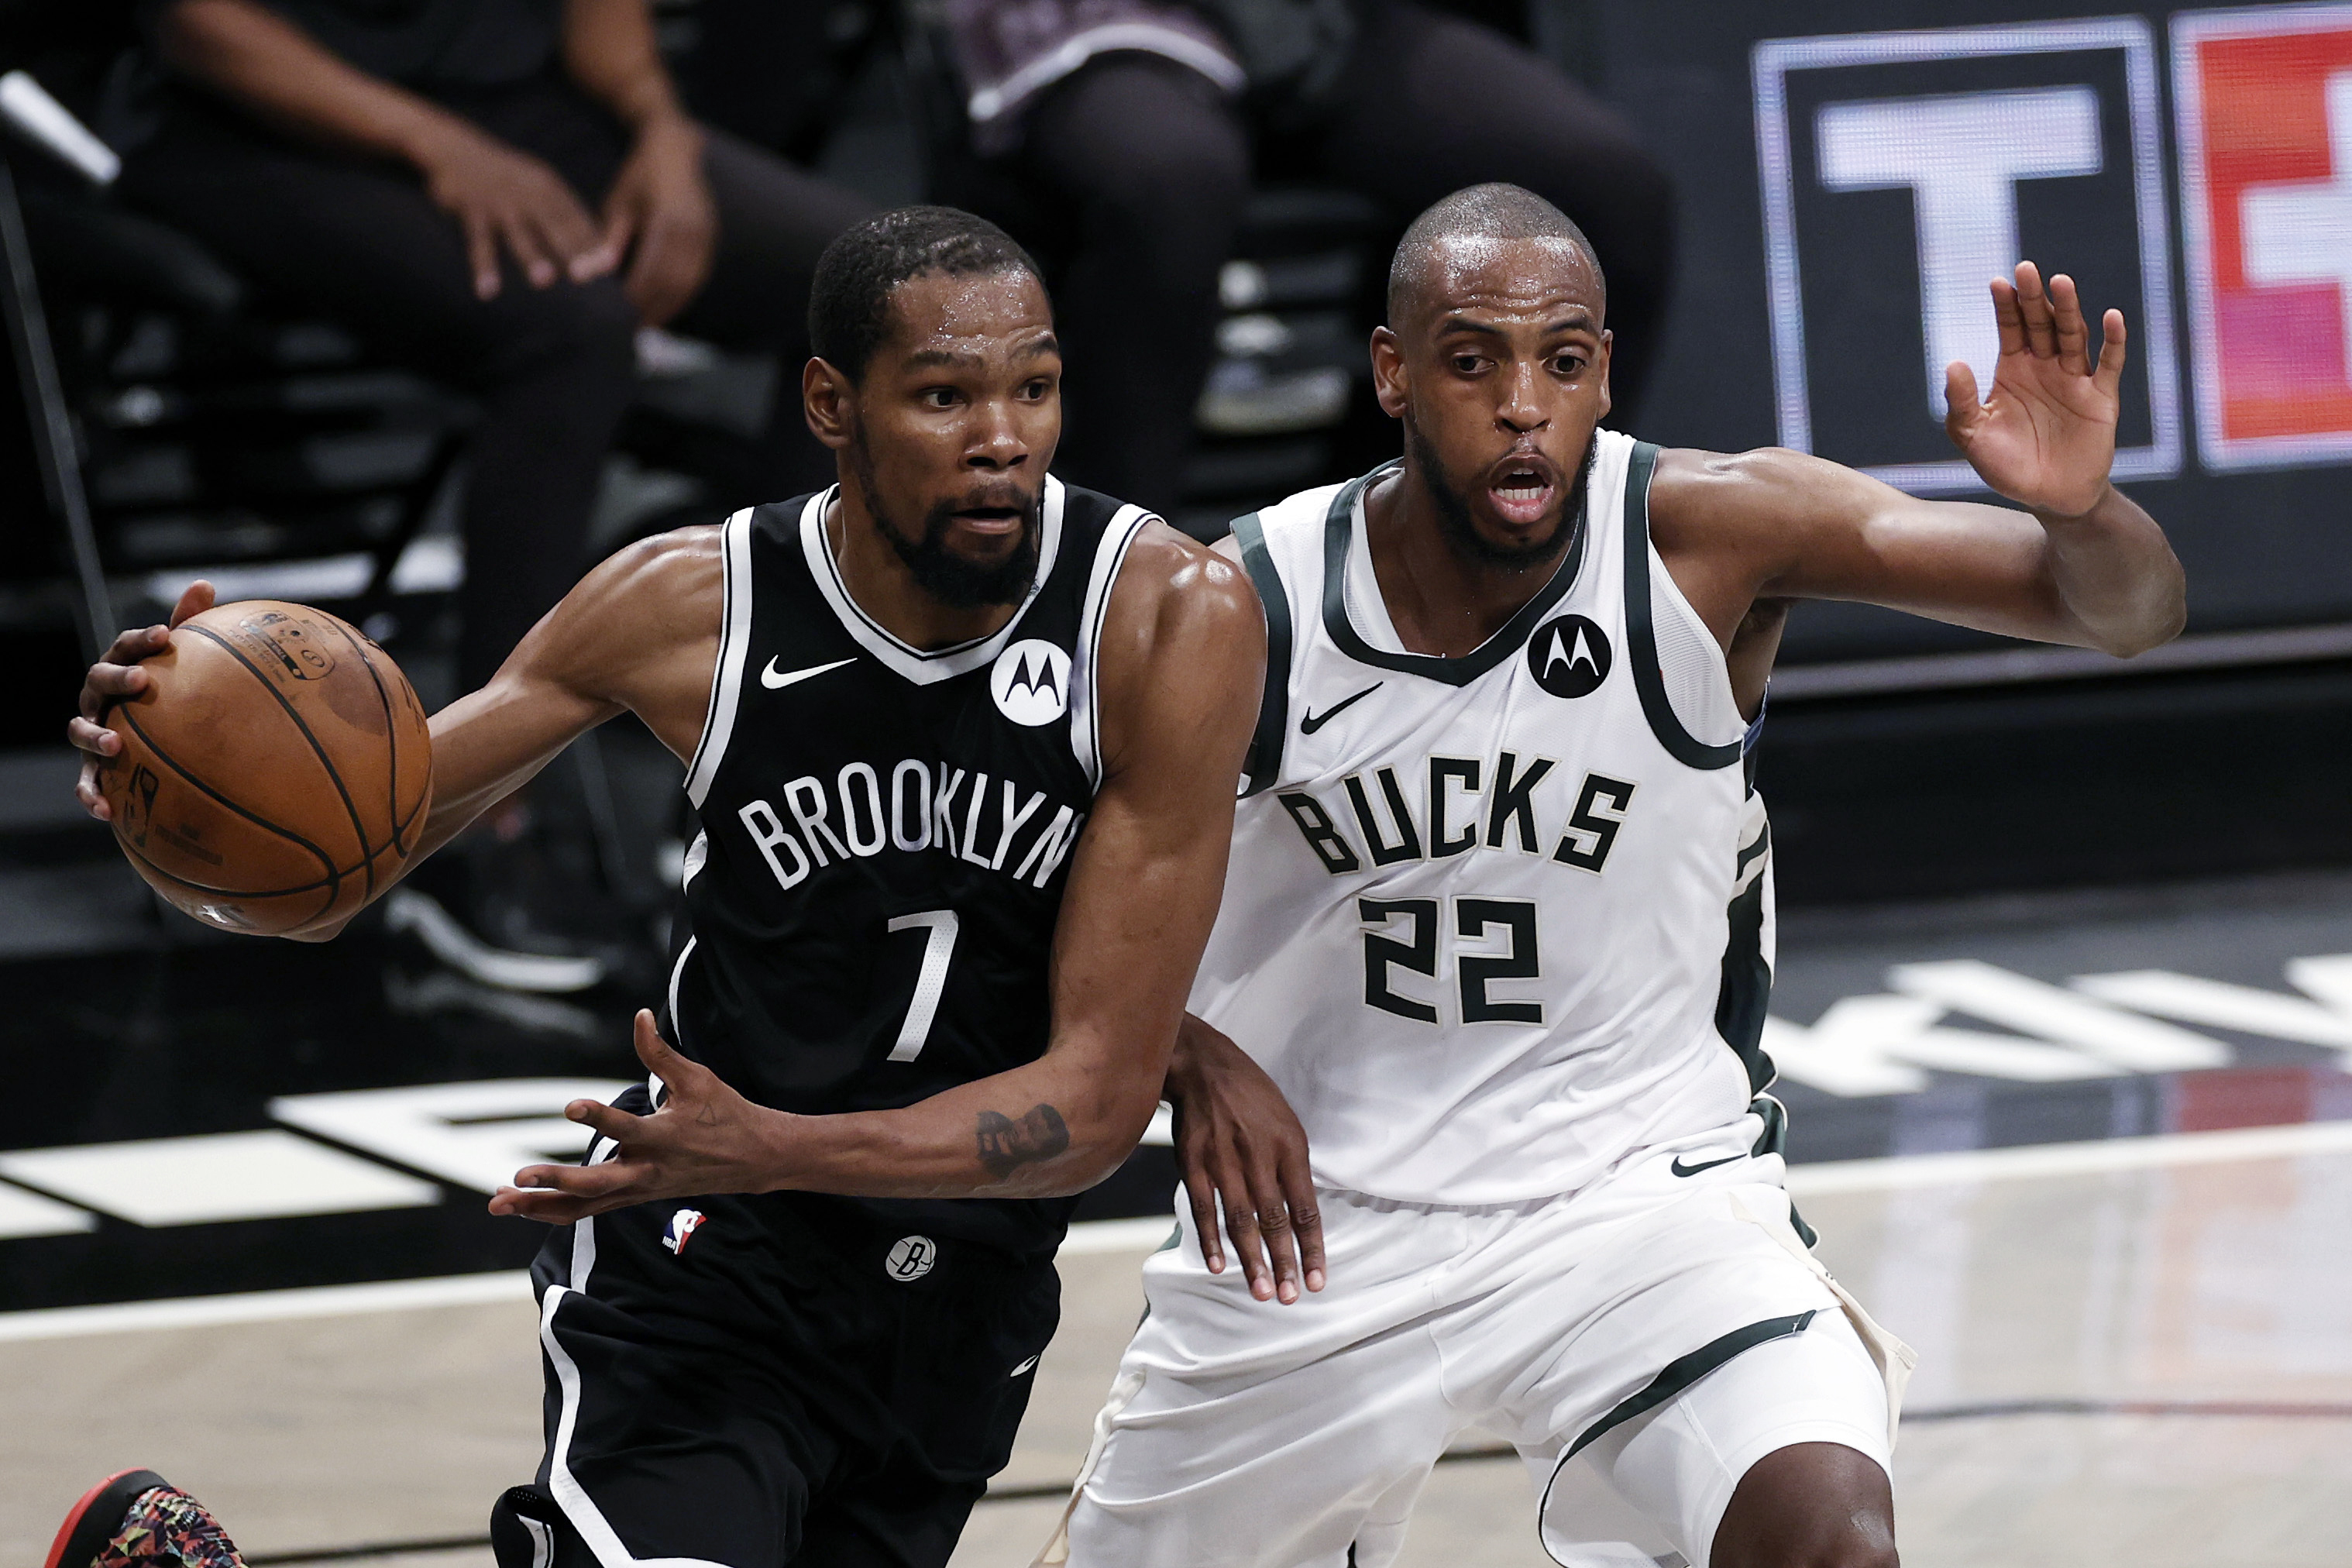 Bucks drop game one against Nets 115-107